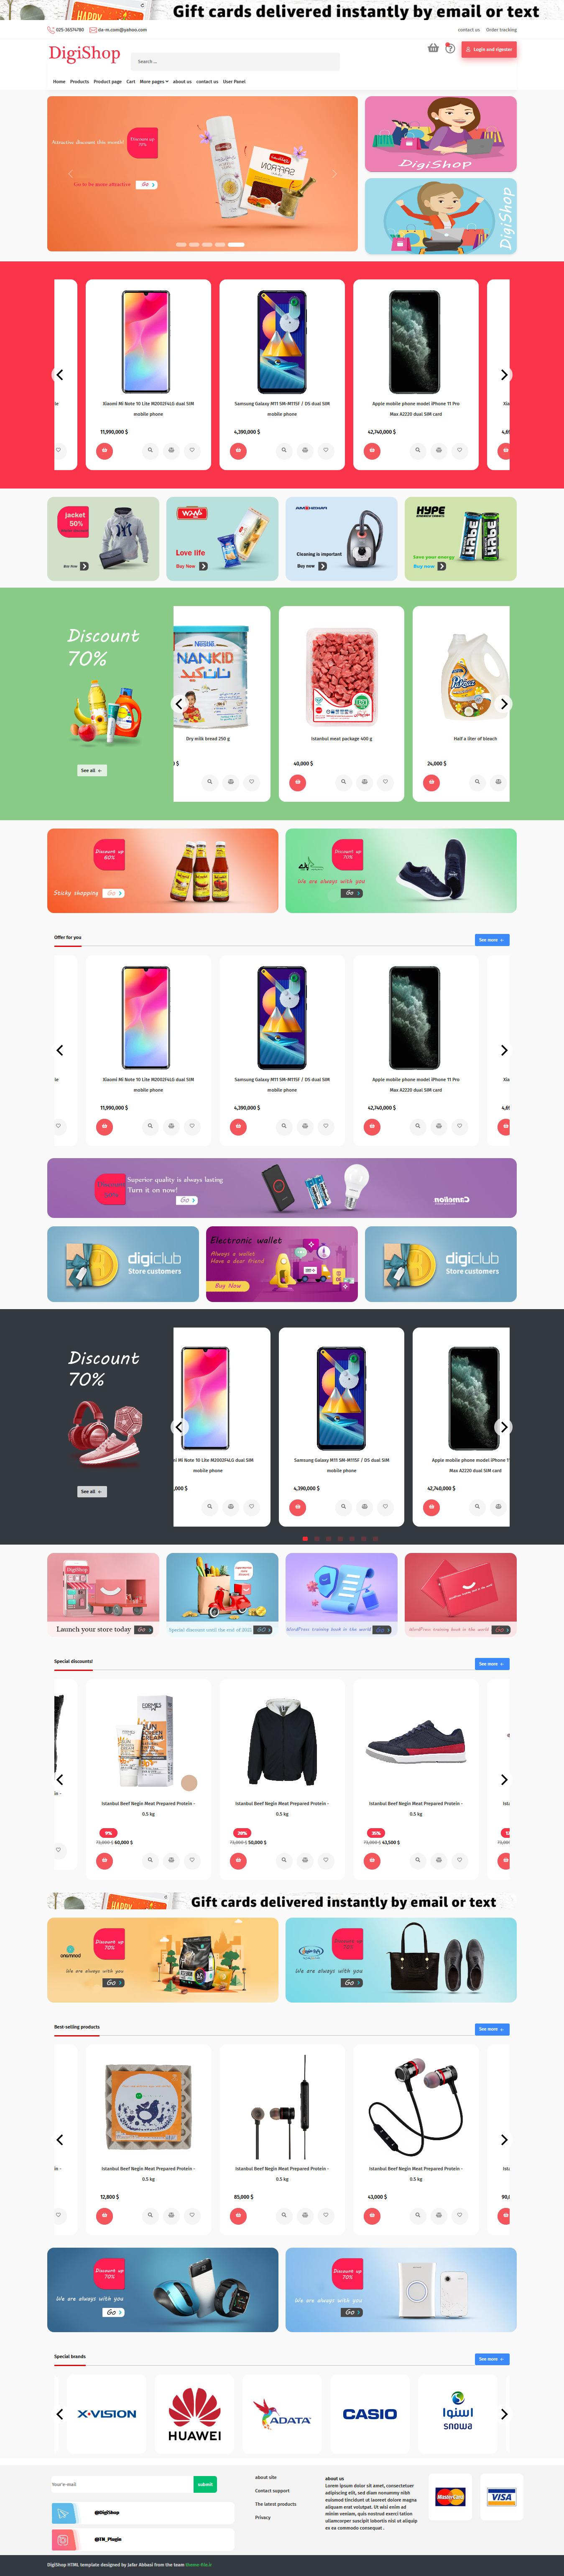 9qtn_screen.jpg